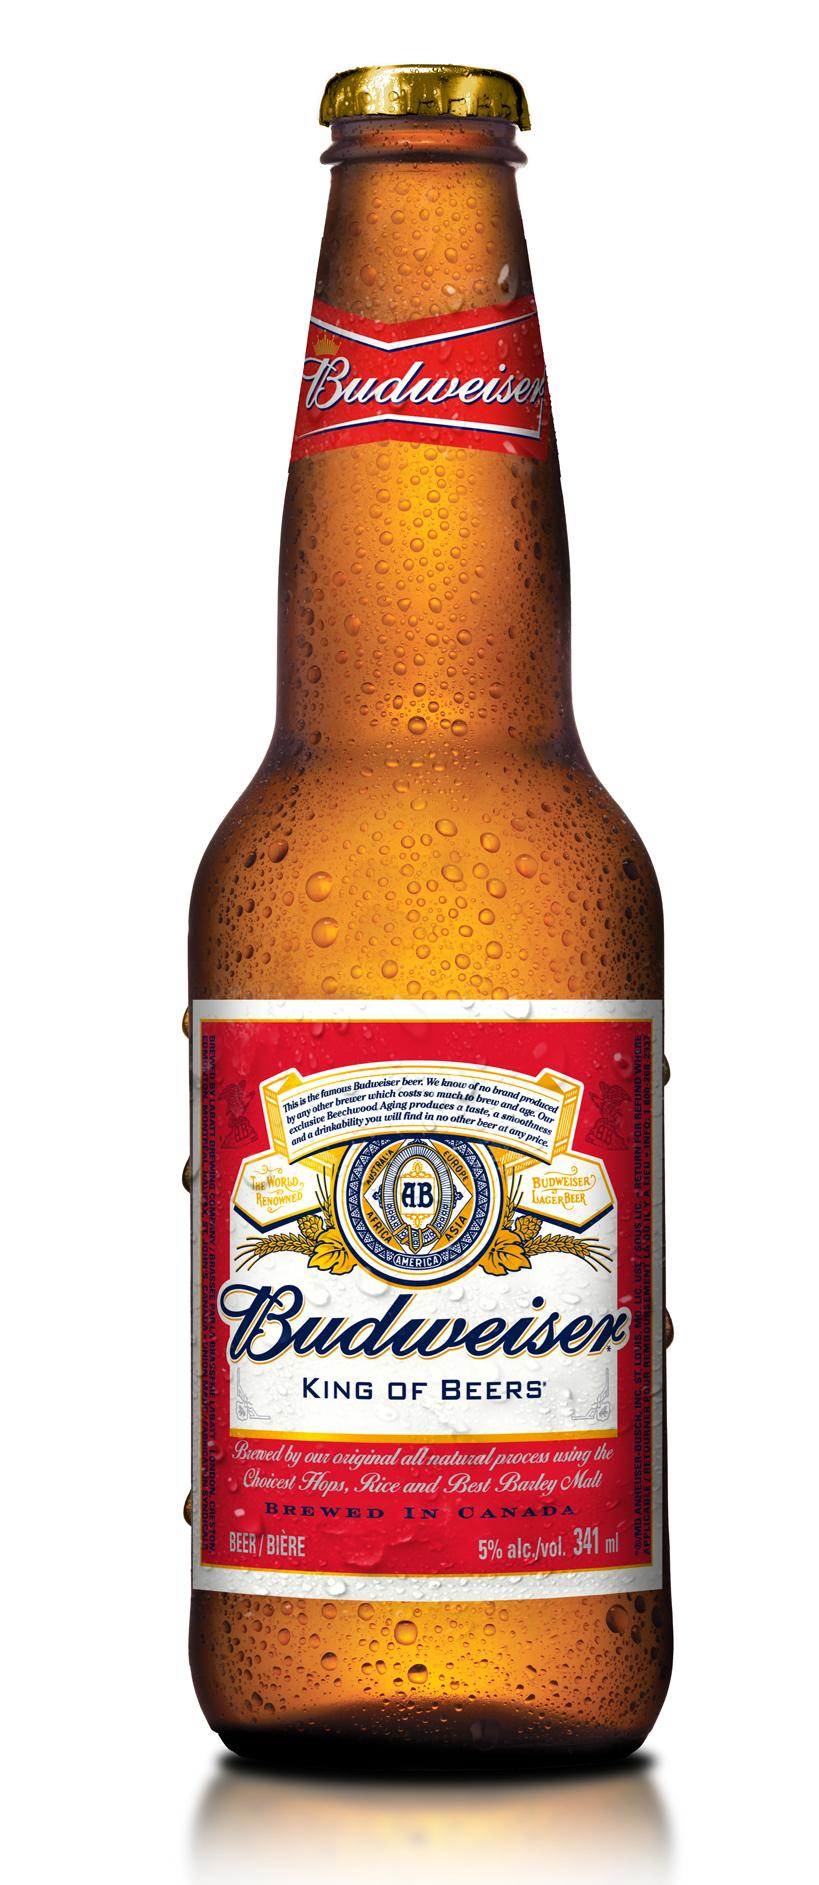 Budweiser bottle1 » strategy